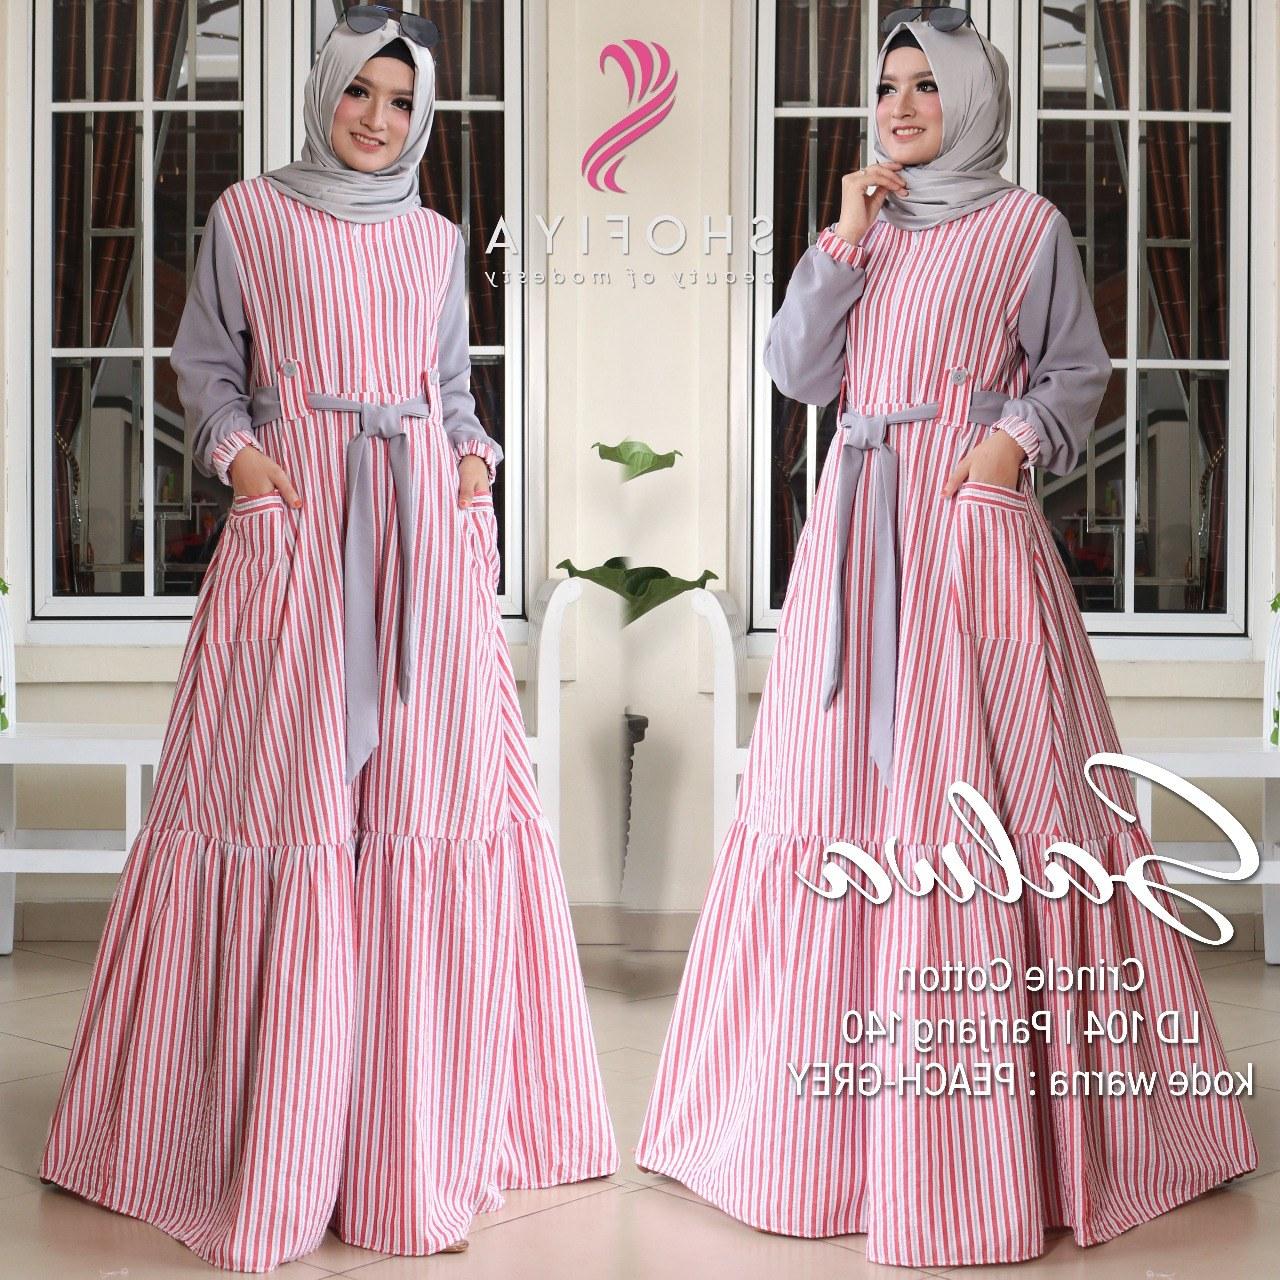 Design Baju Lebaran Model Terbaru Xtd6 Model Baju Gamis Terbaru Lebaran Gambar islami